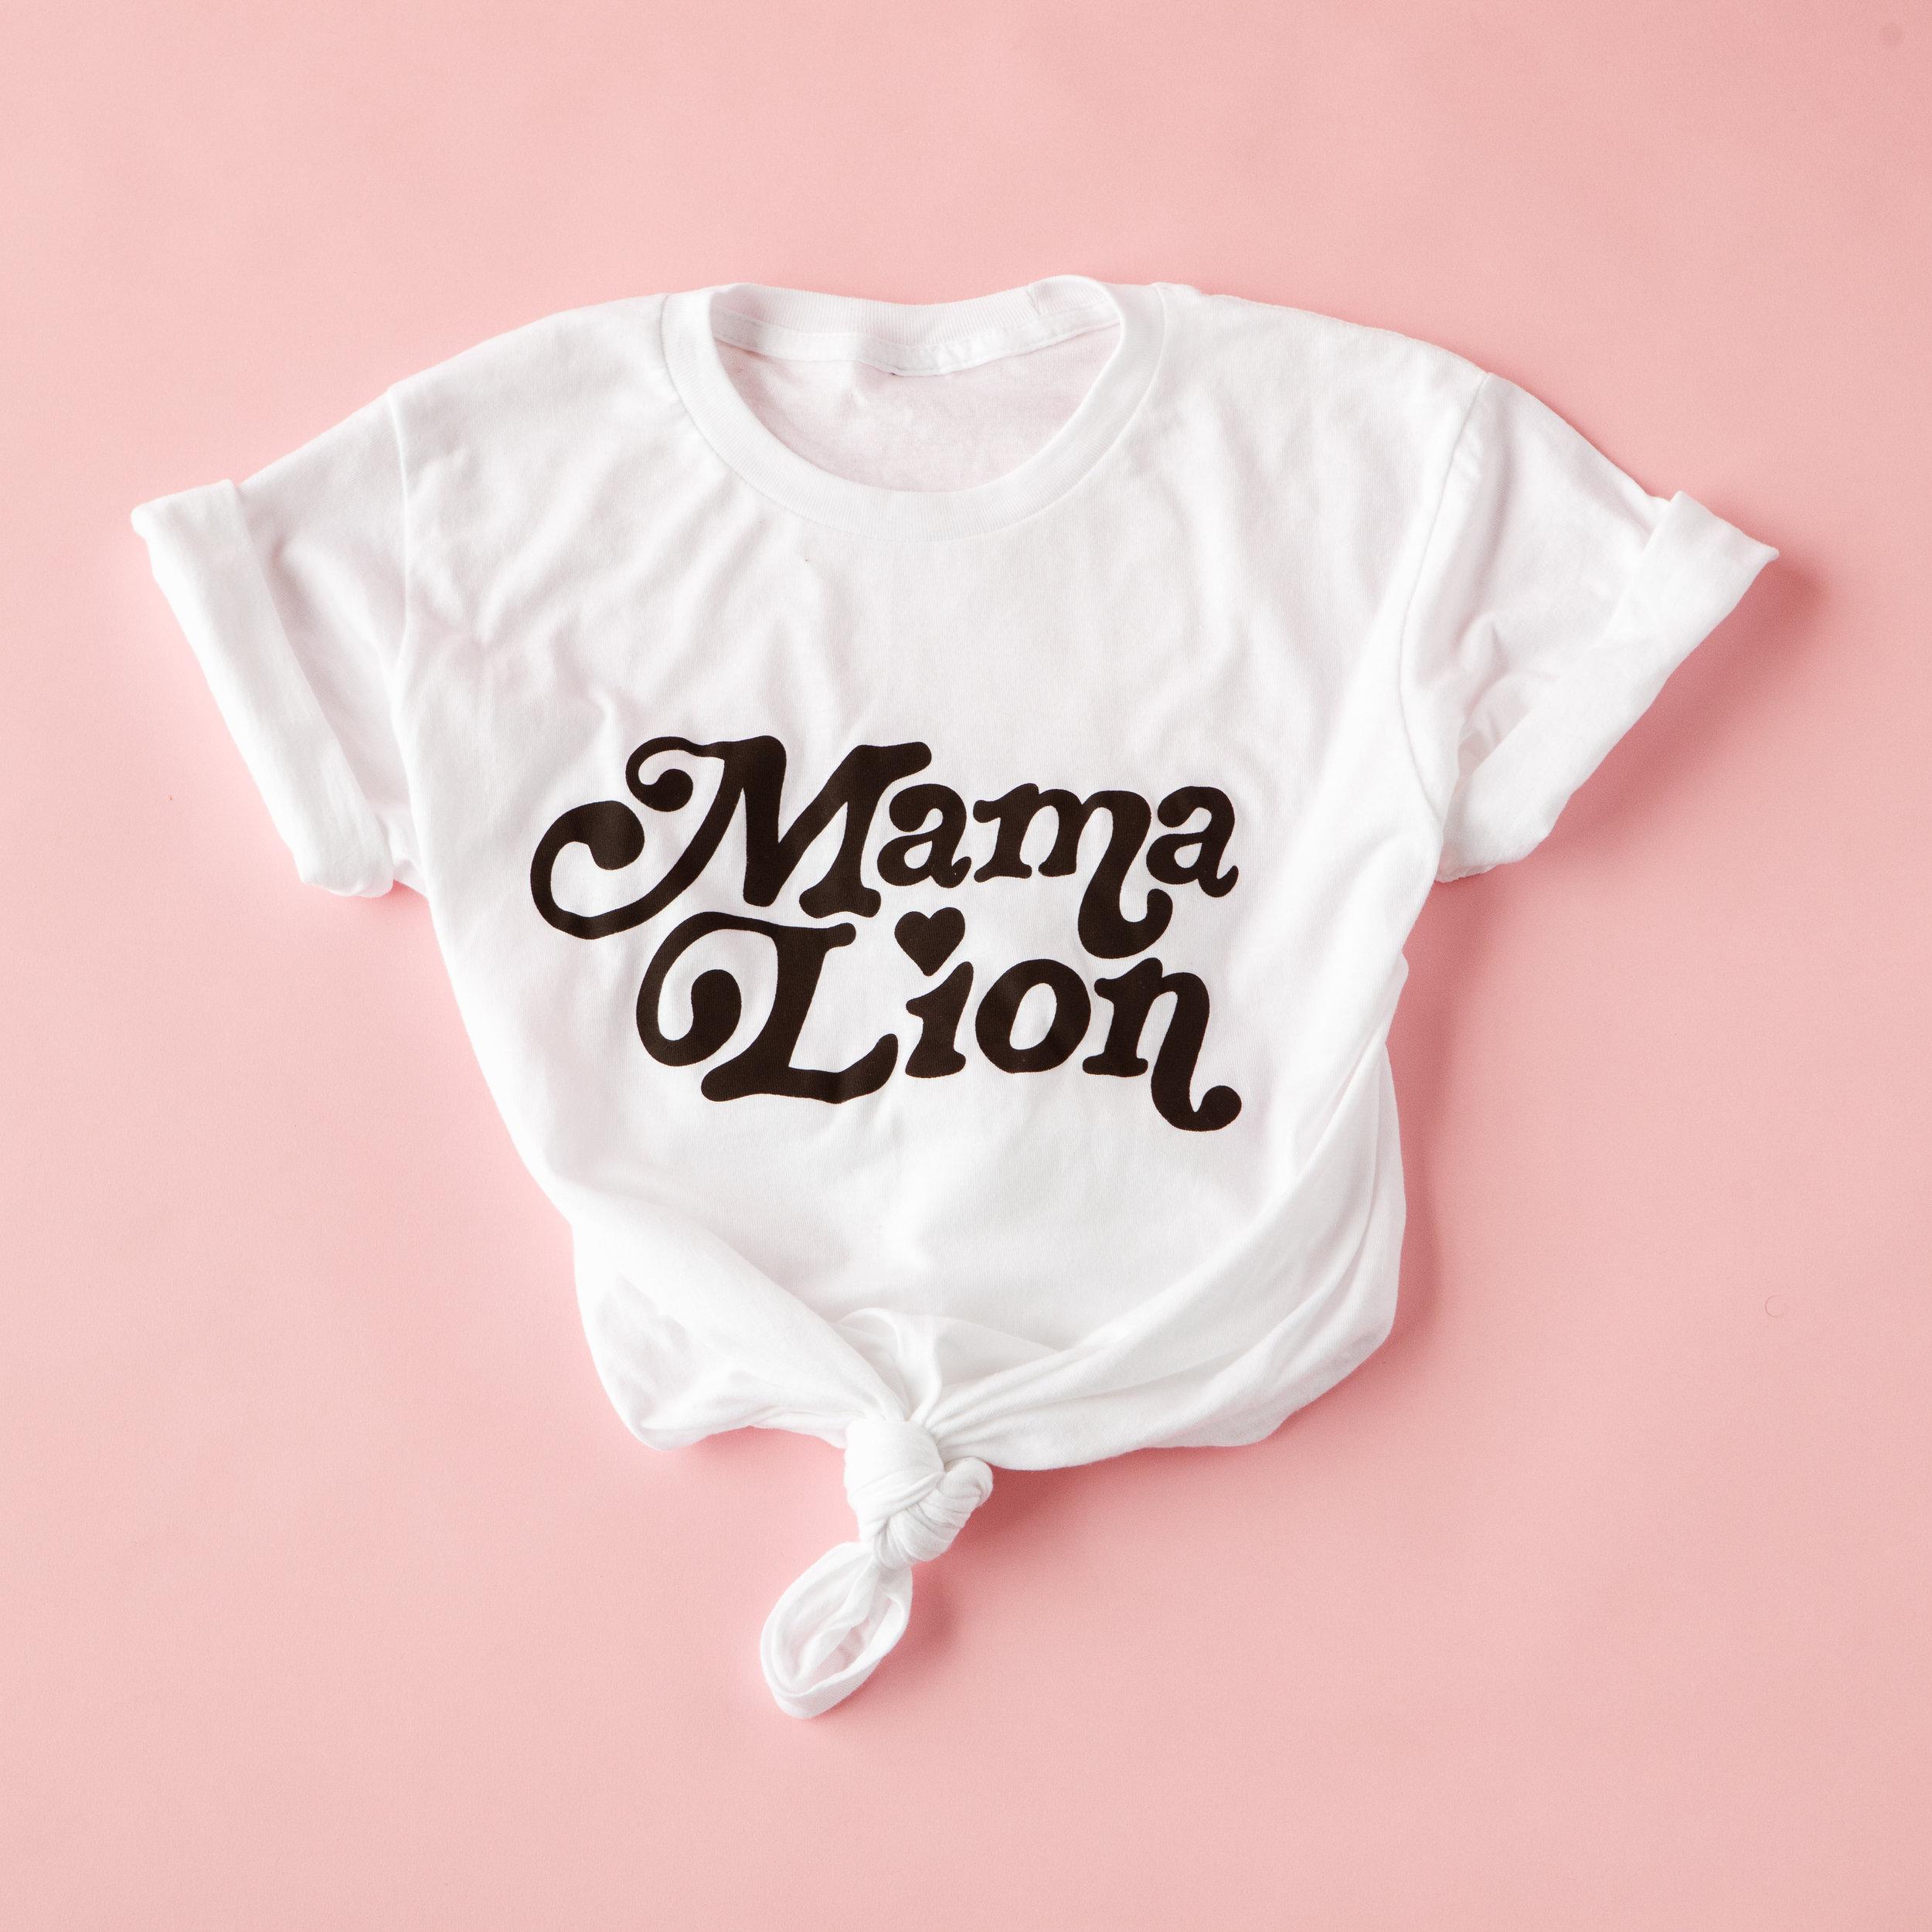 Psst! - Every Lion Cub has a proud Mama Lion!